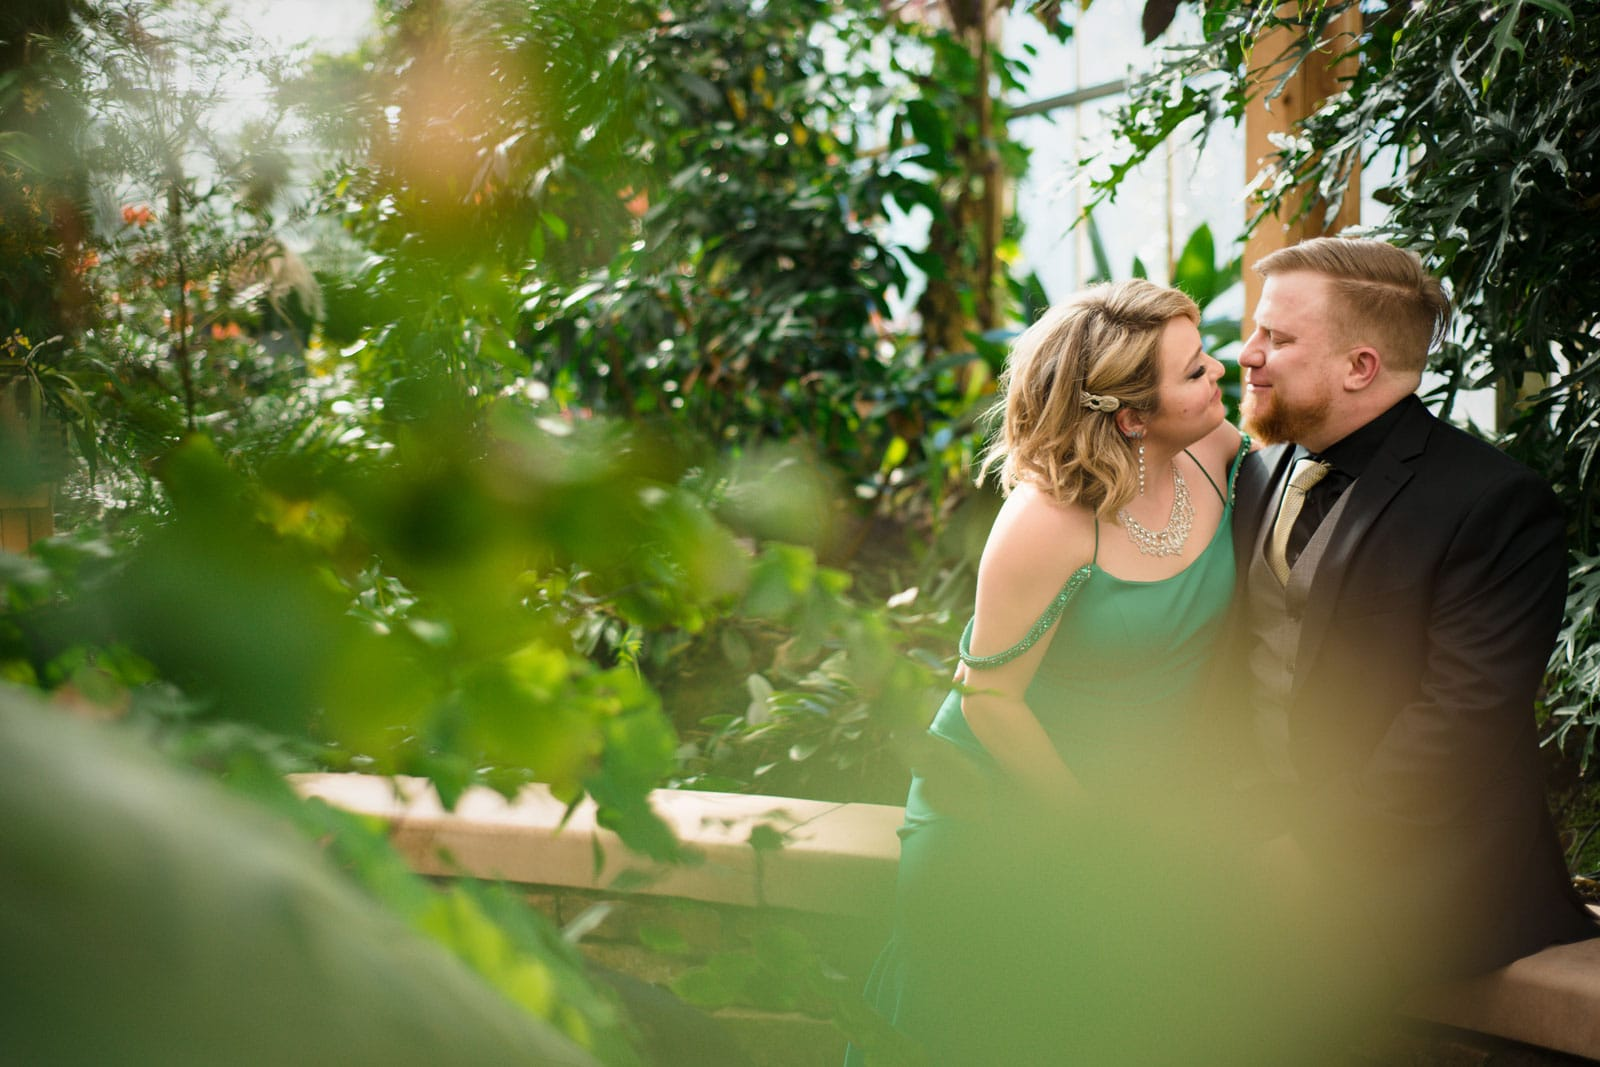 anniversary portraits in Atlanta Botanical Gardens for couple in formal attire